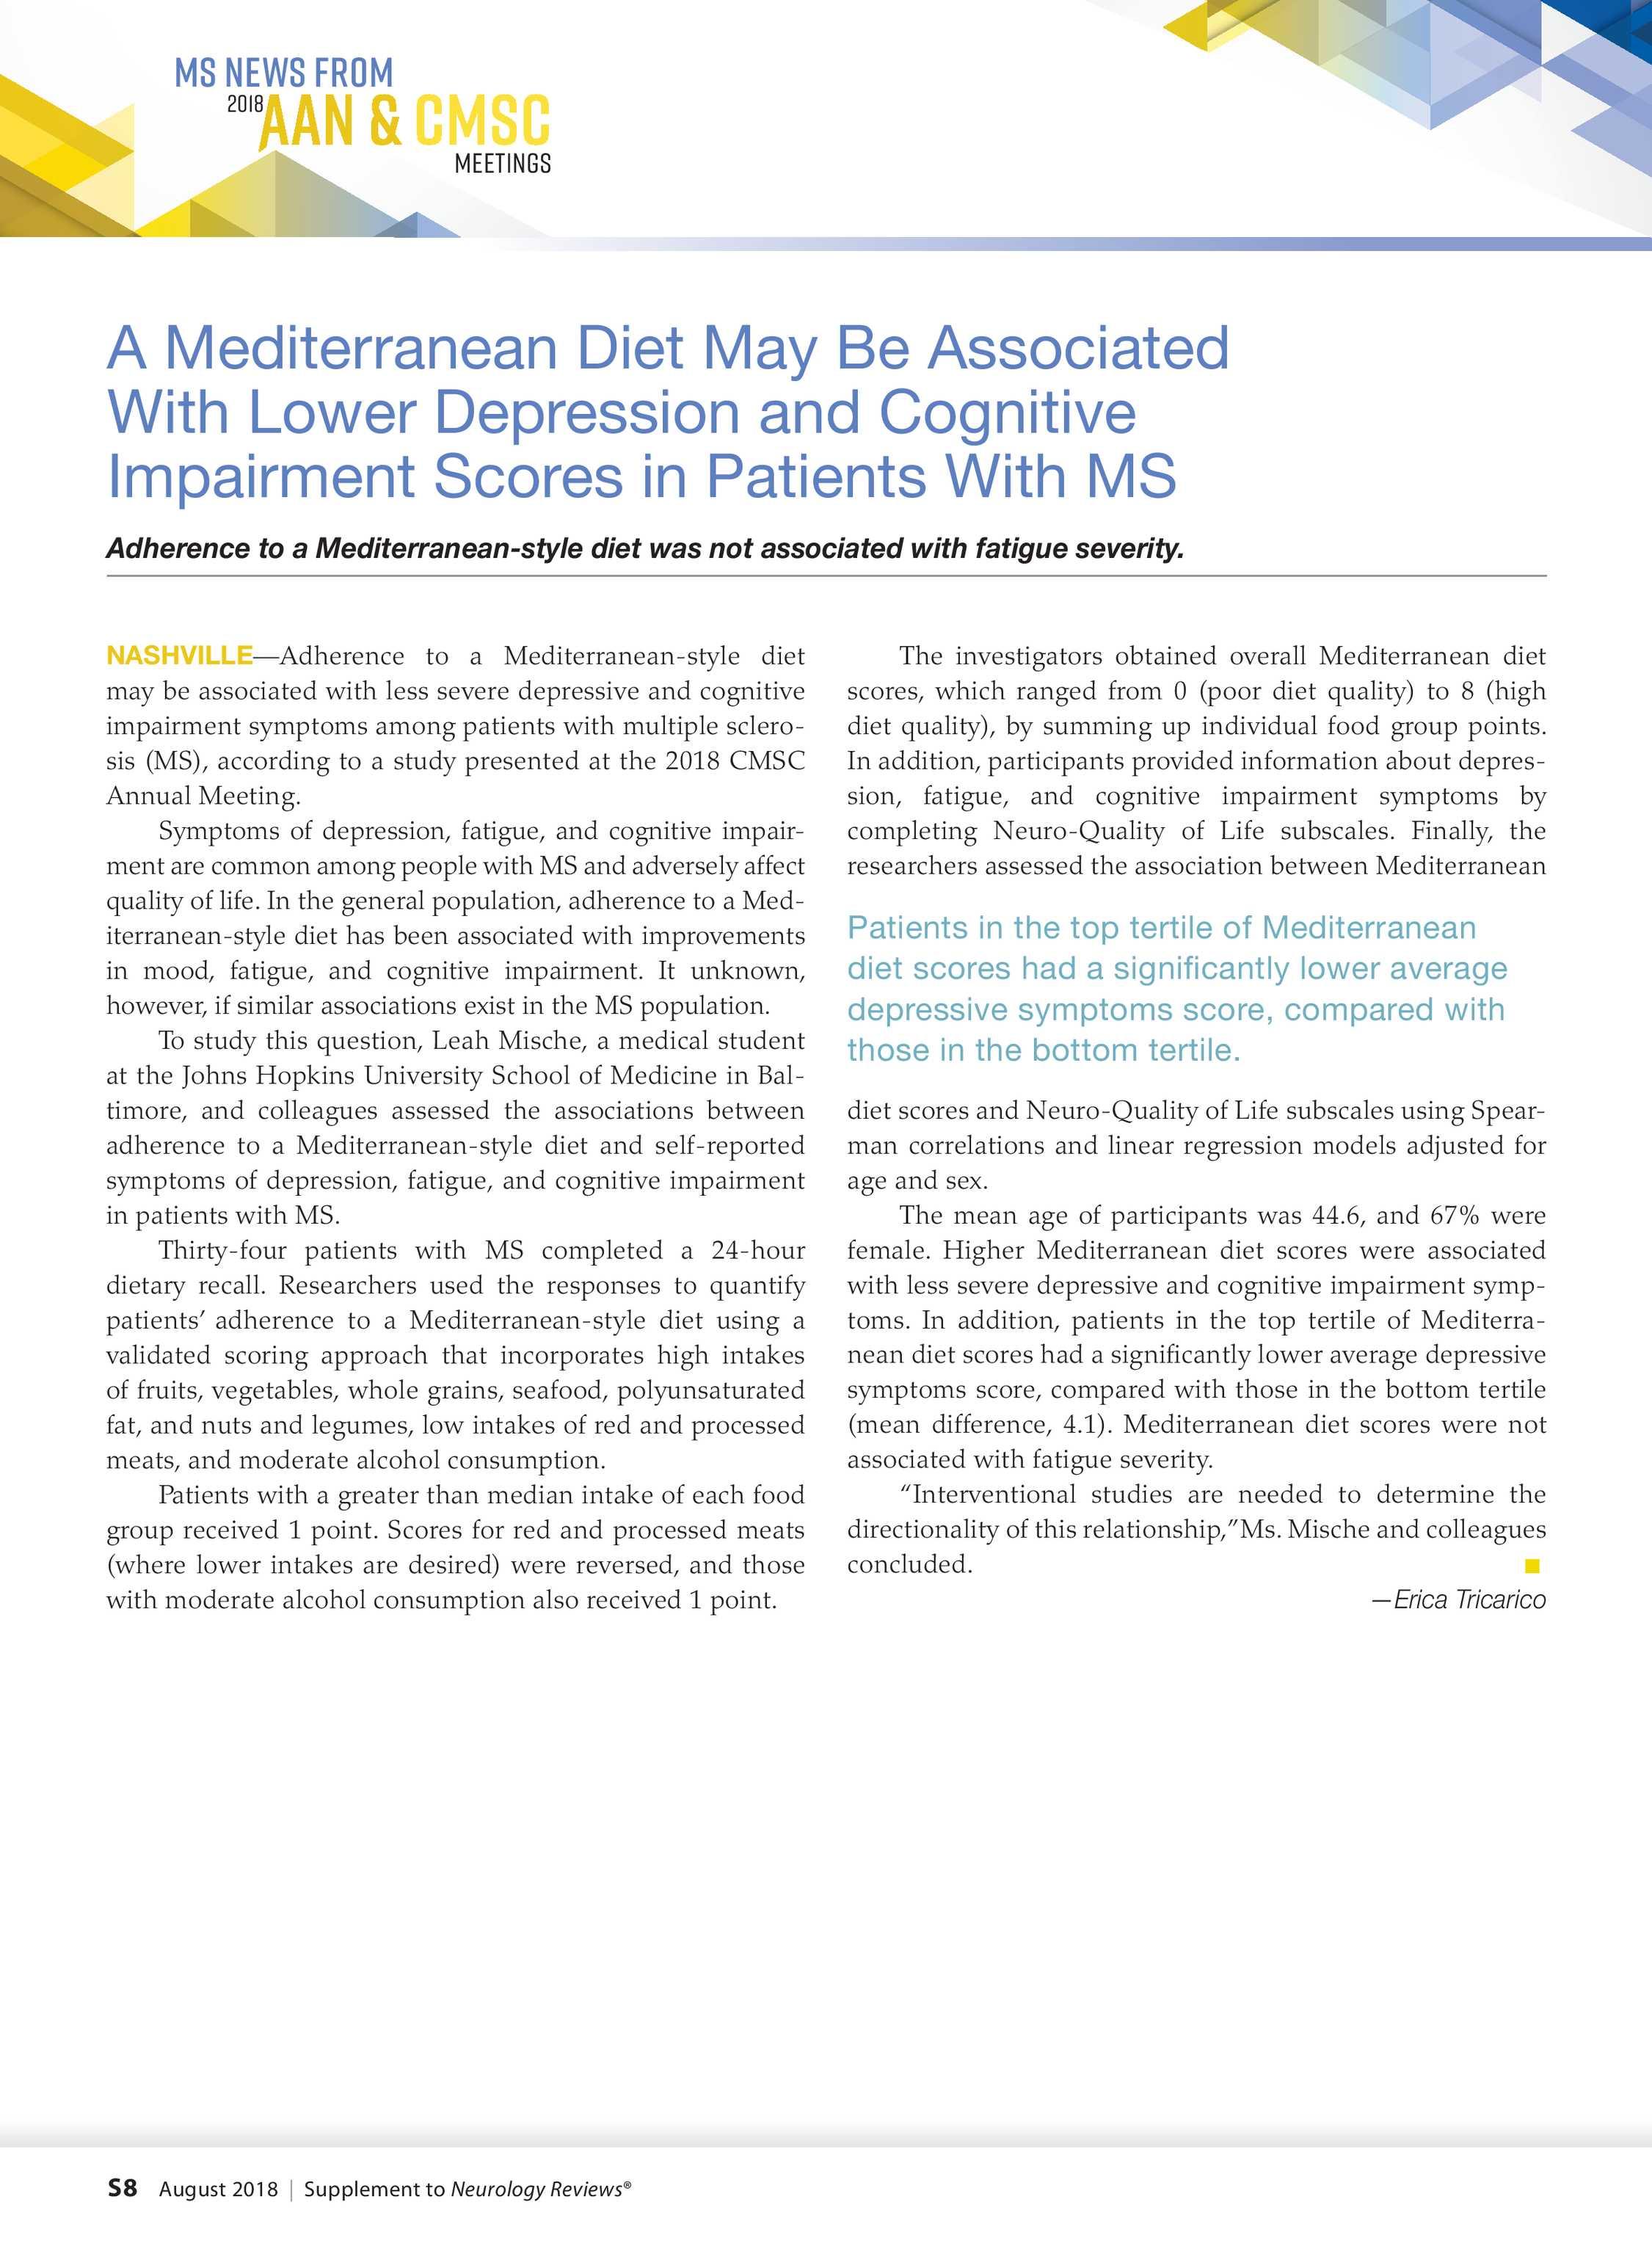 Neurology Reviews - NR AAN CMSC Supplement 0818 - page S7